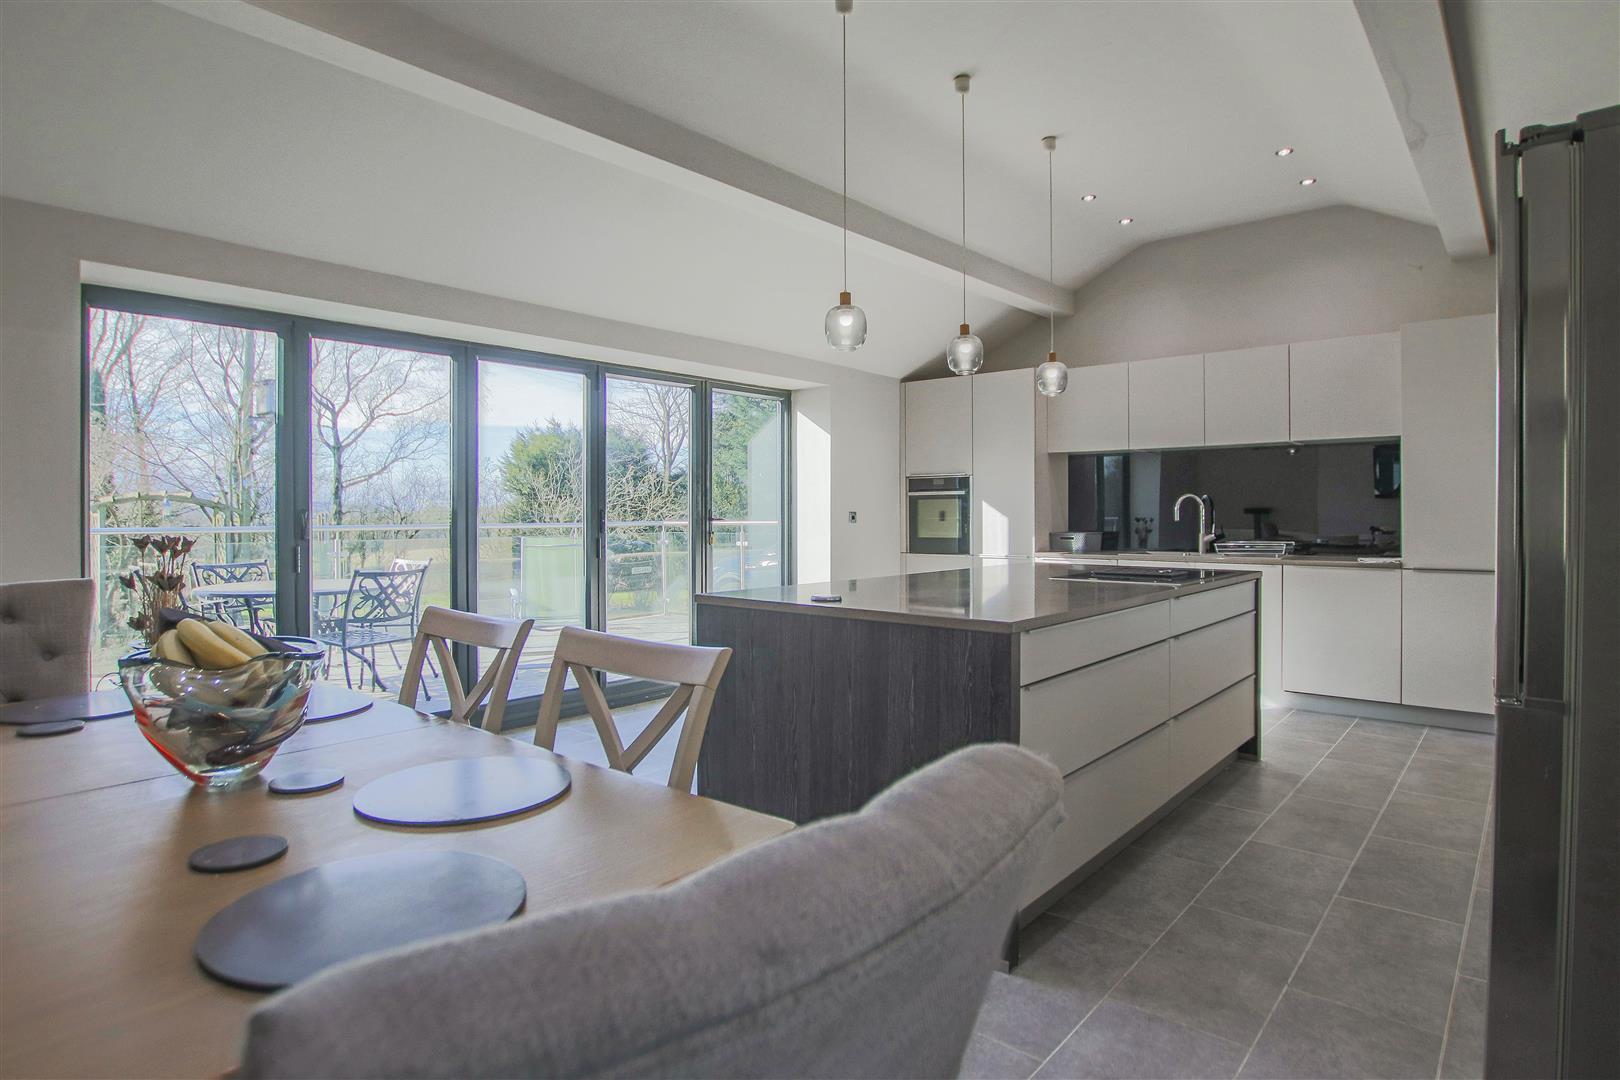 6 Bedroom Barn Conversion For Sale - 18.JPG